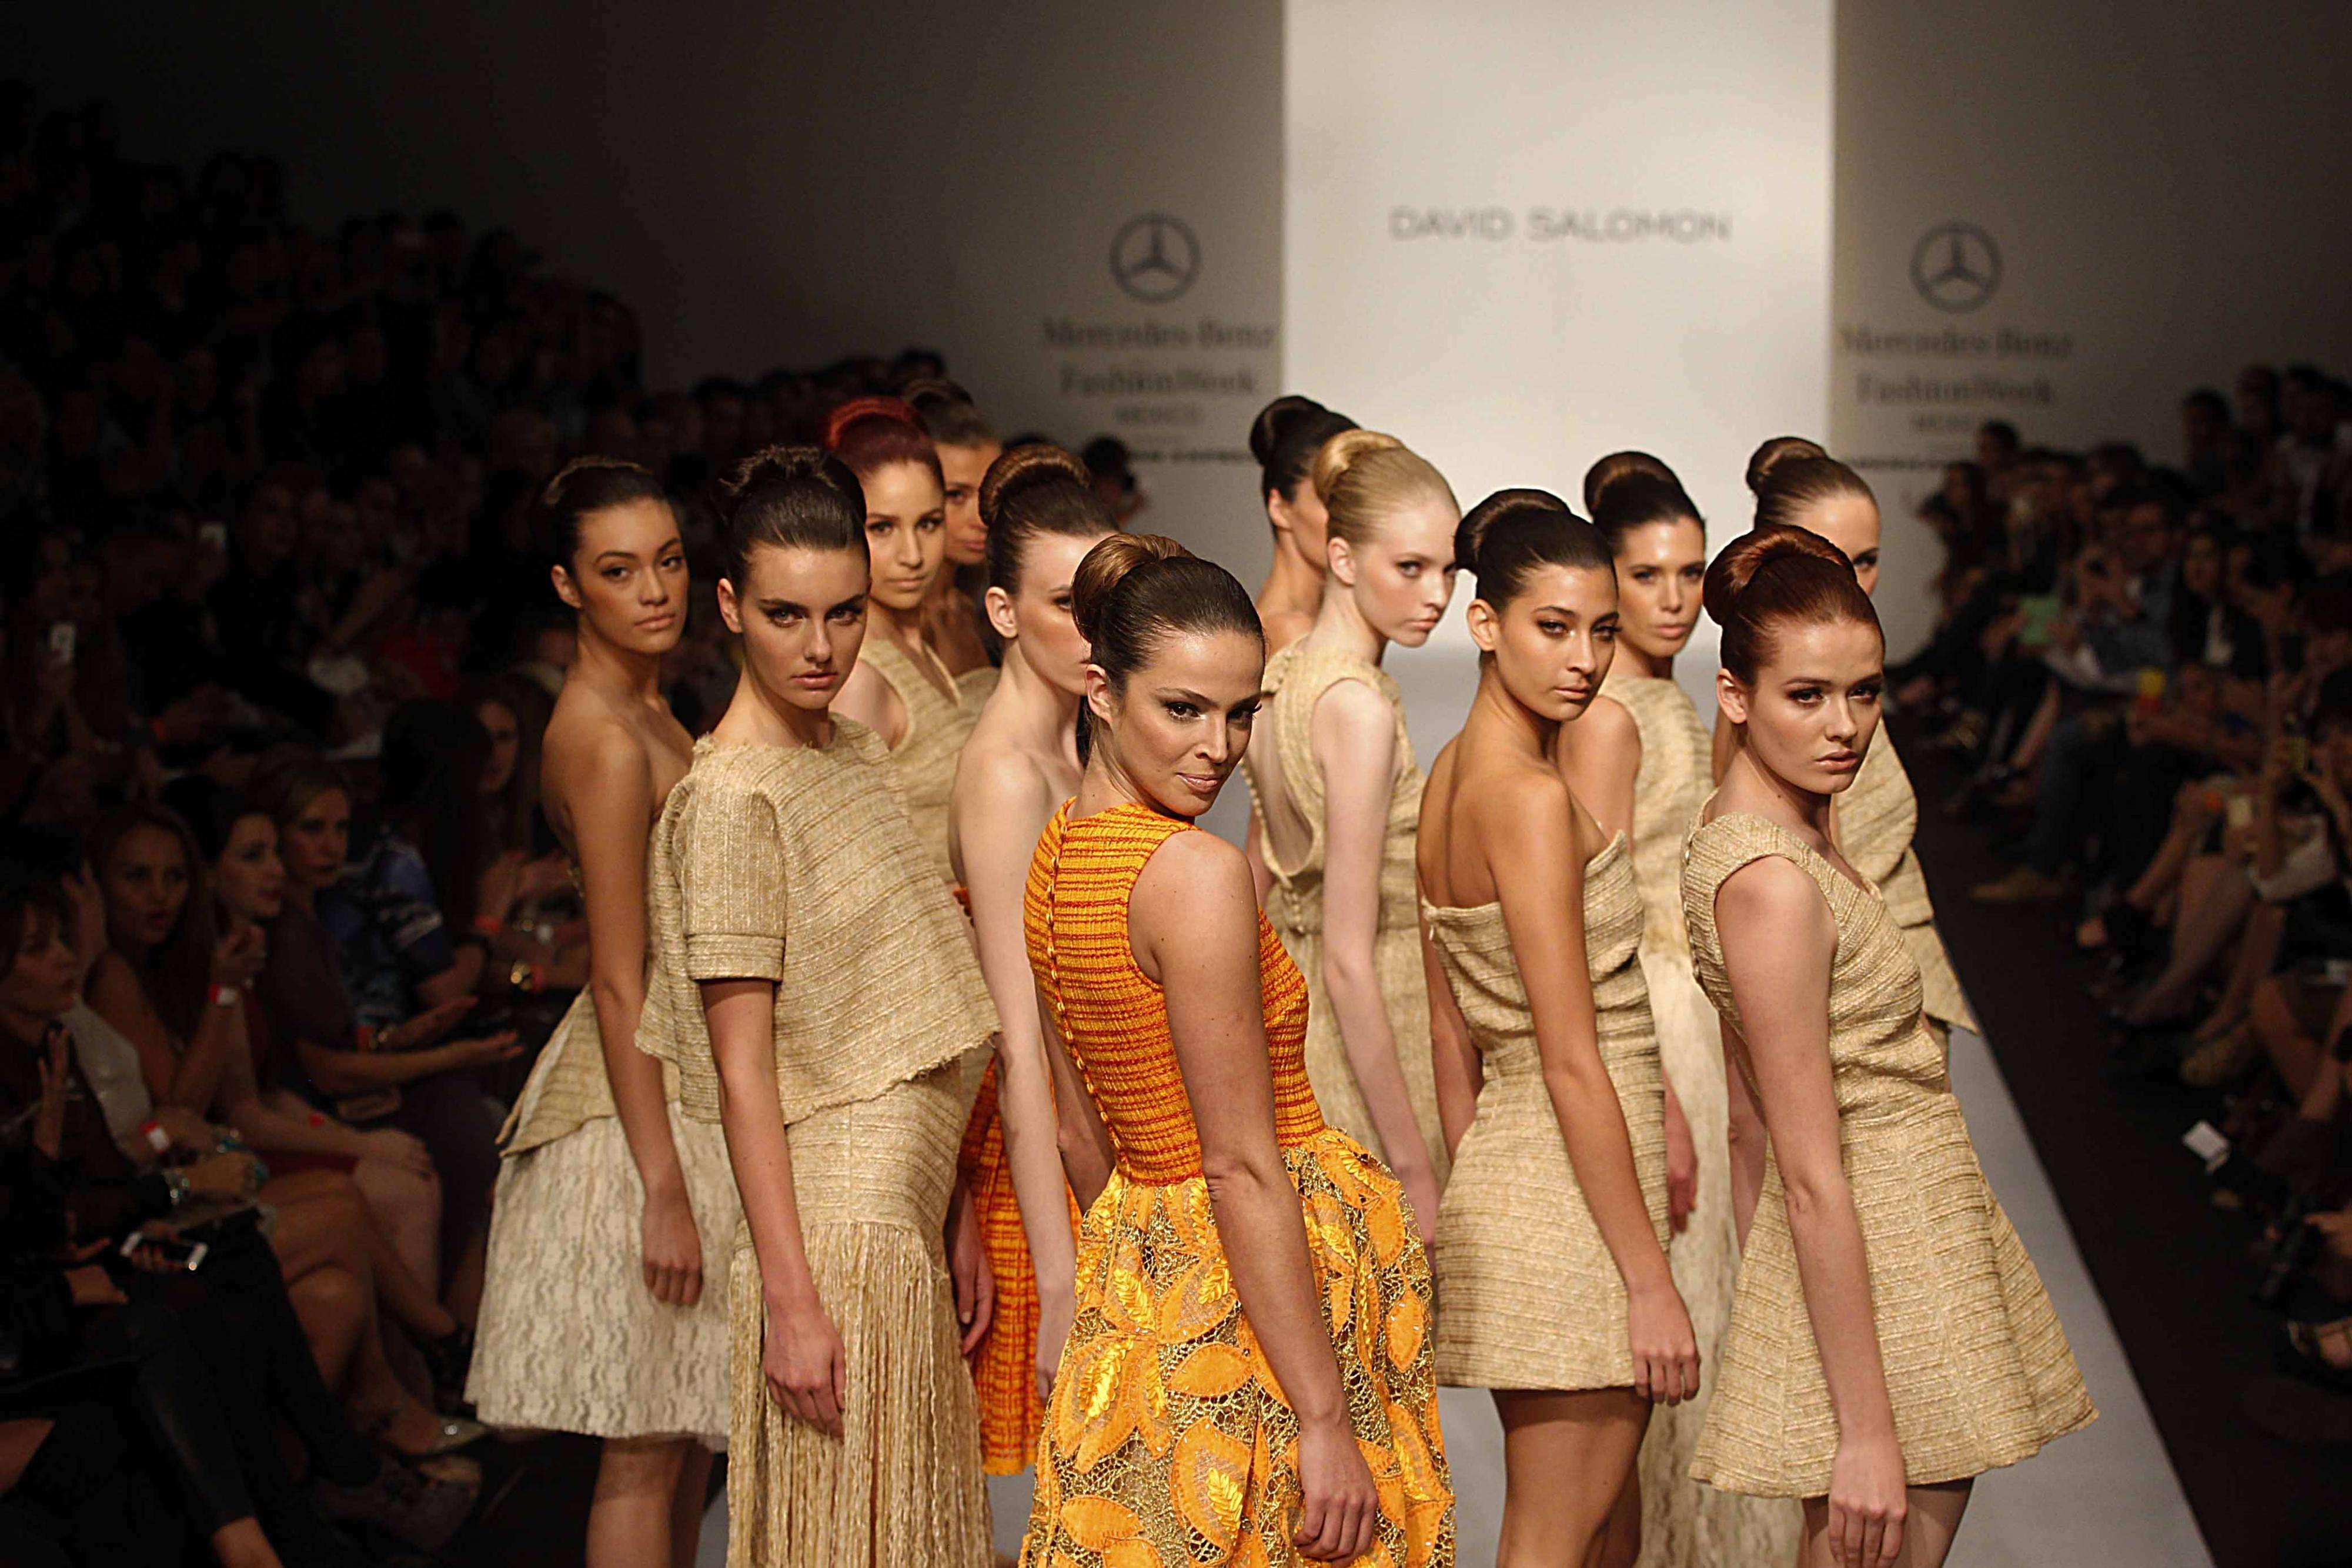 David Salomon desfila en la pasarela de Mercedes-Benz Fashion Week México Foto: Ulises Bravo/Terra